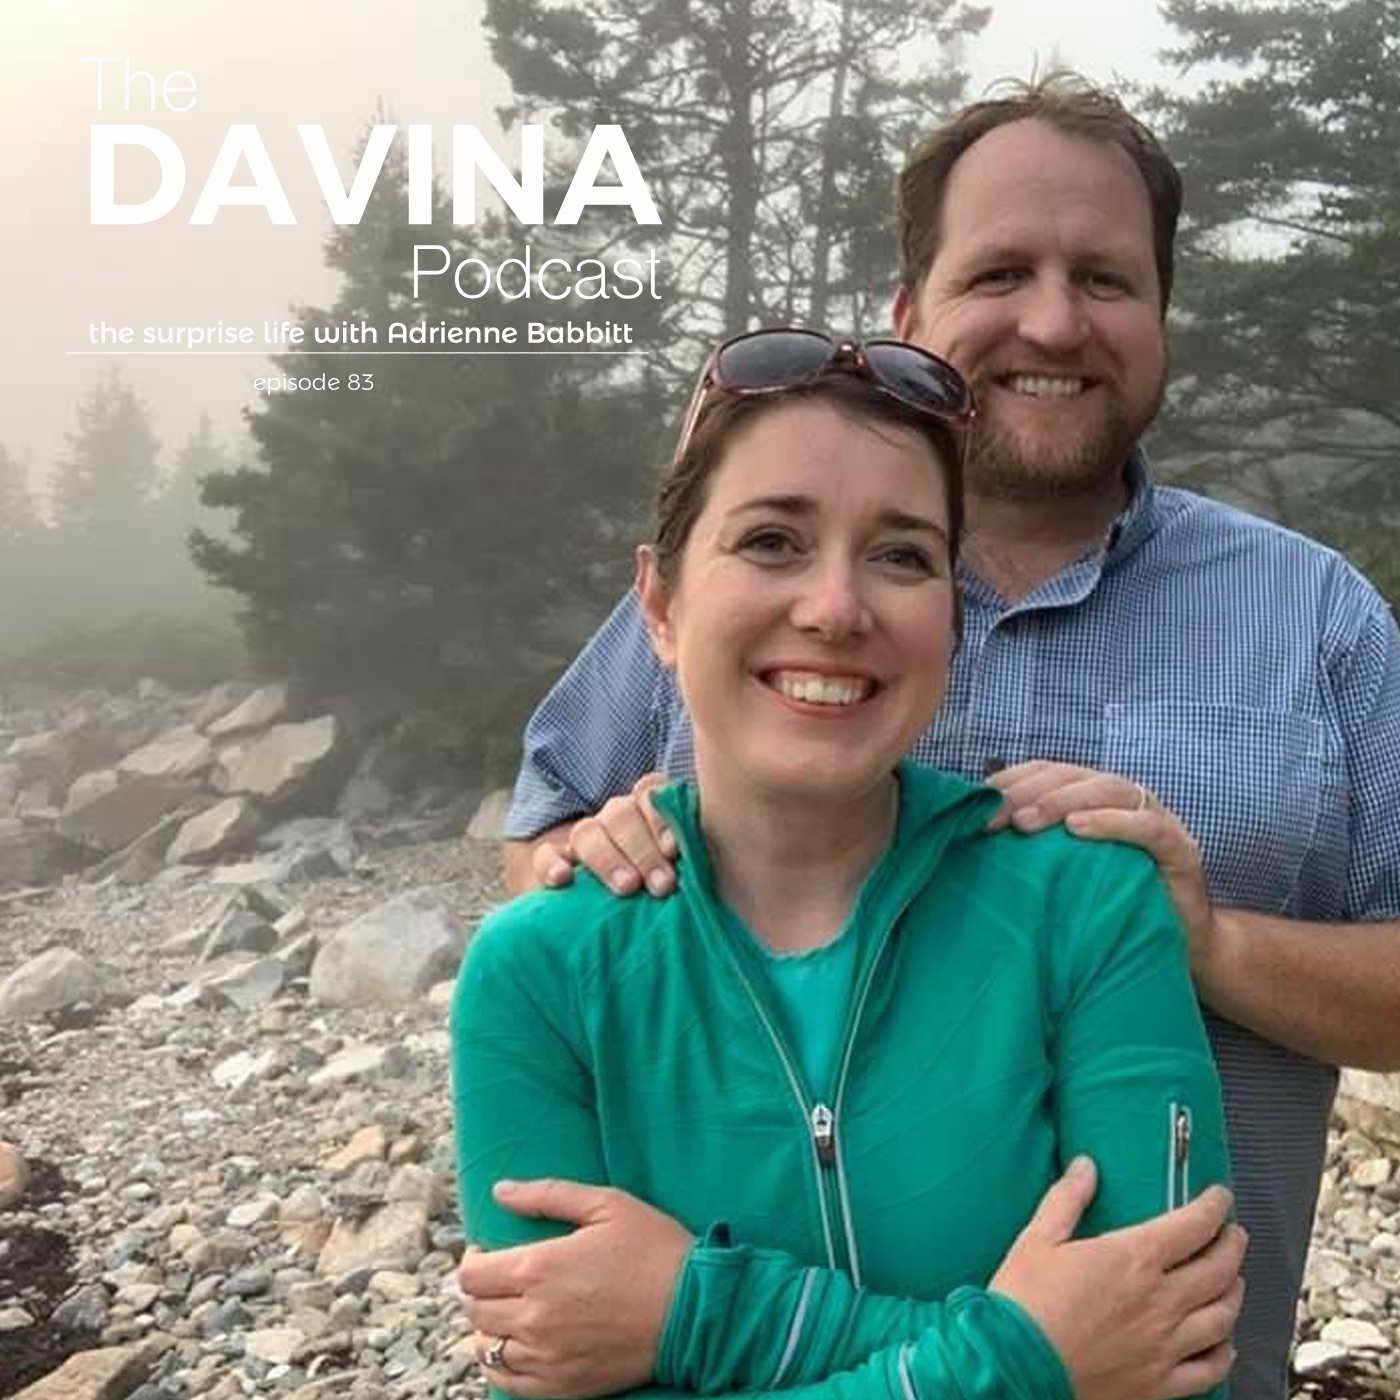 Episode 83: Surprise Life with Adrienne Babbitt